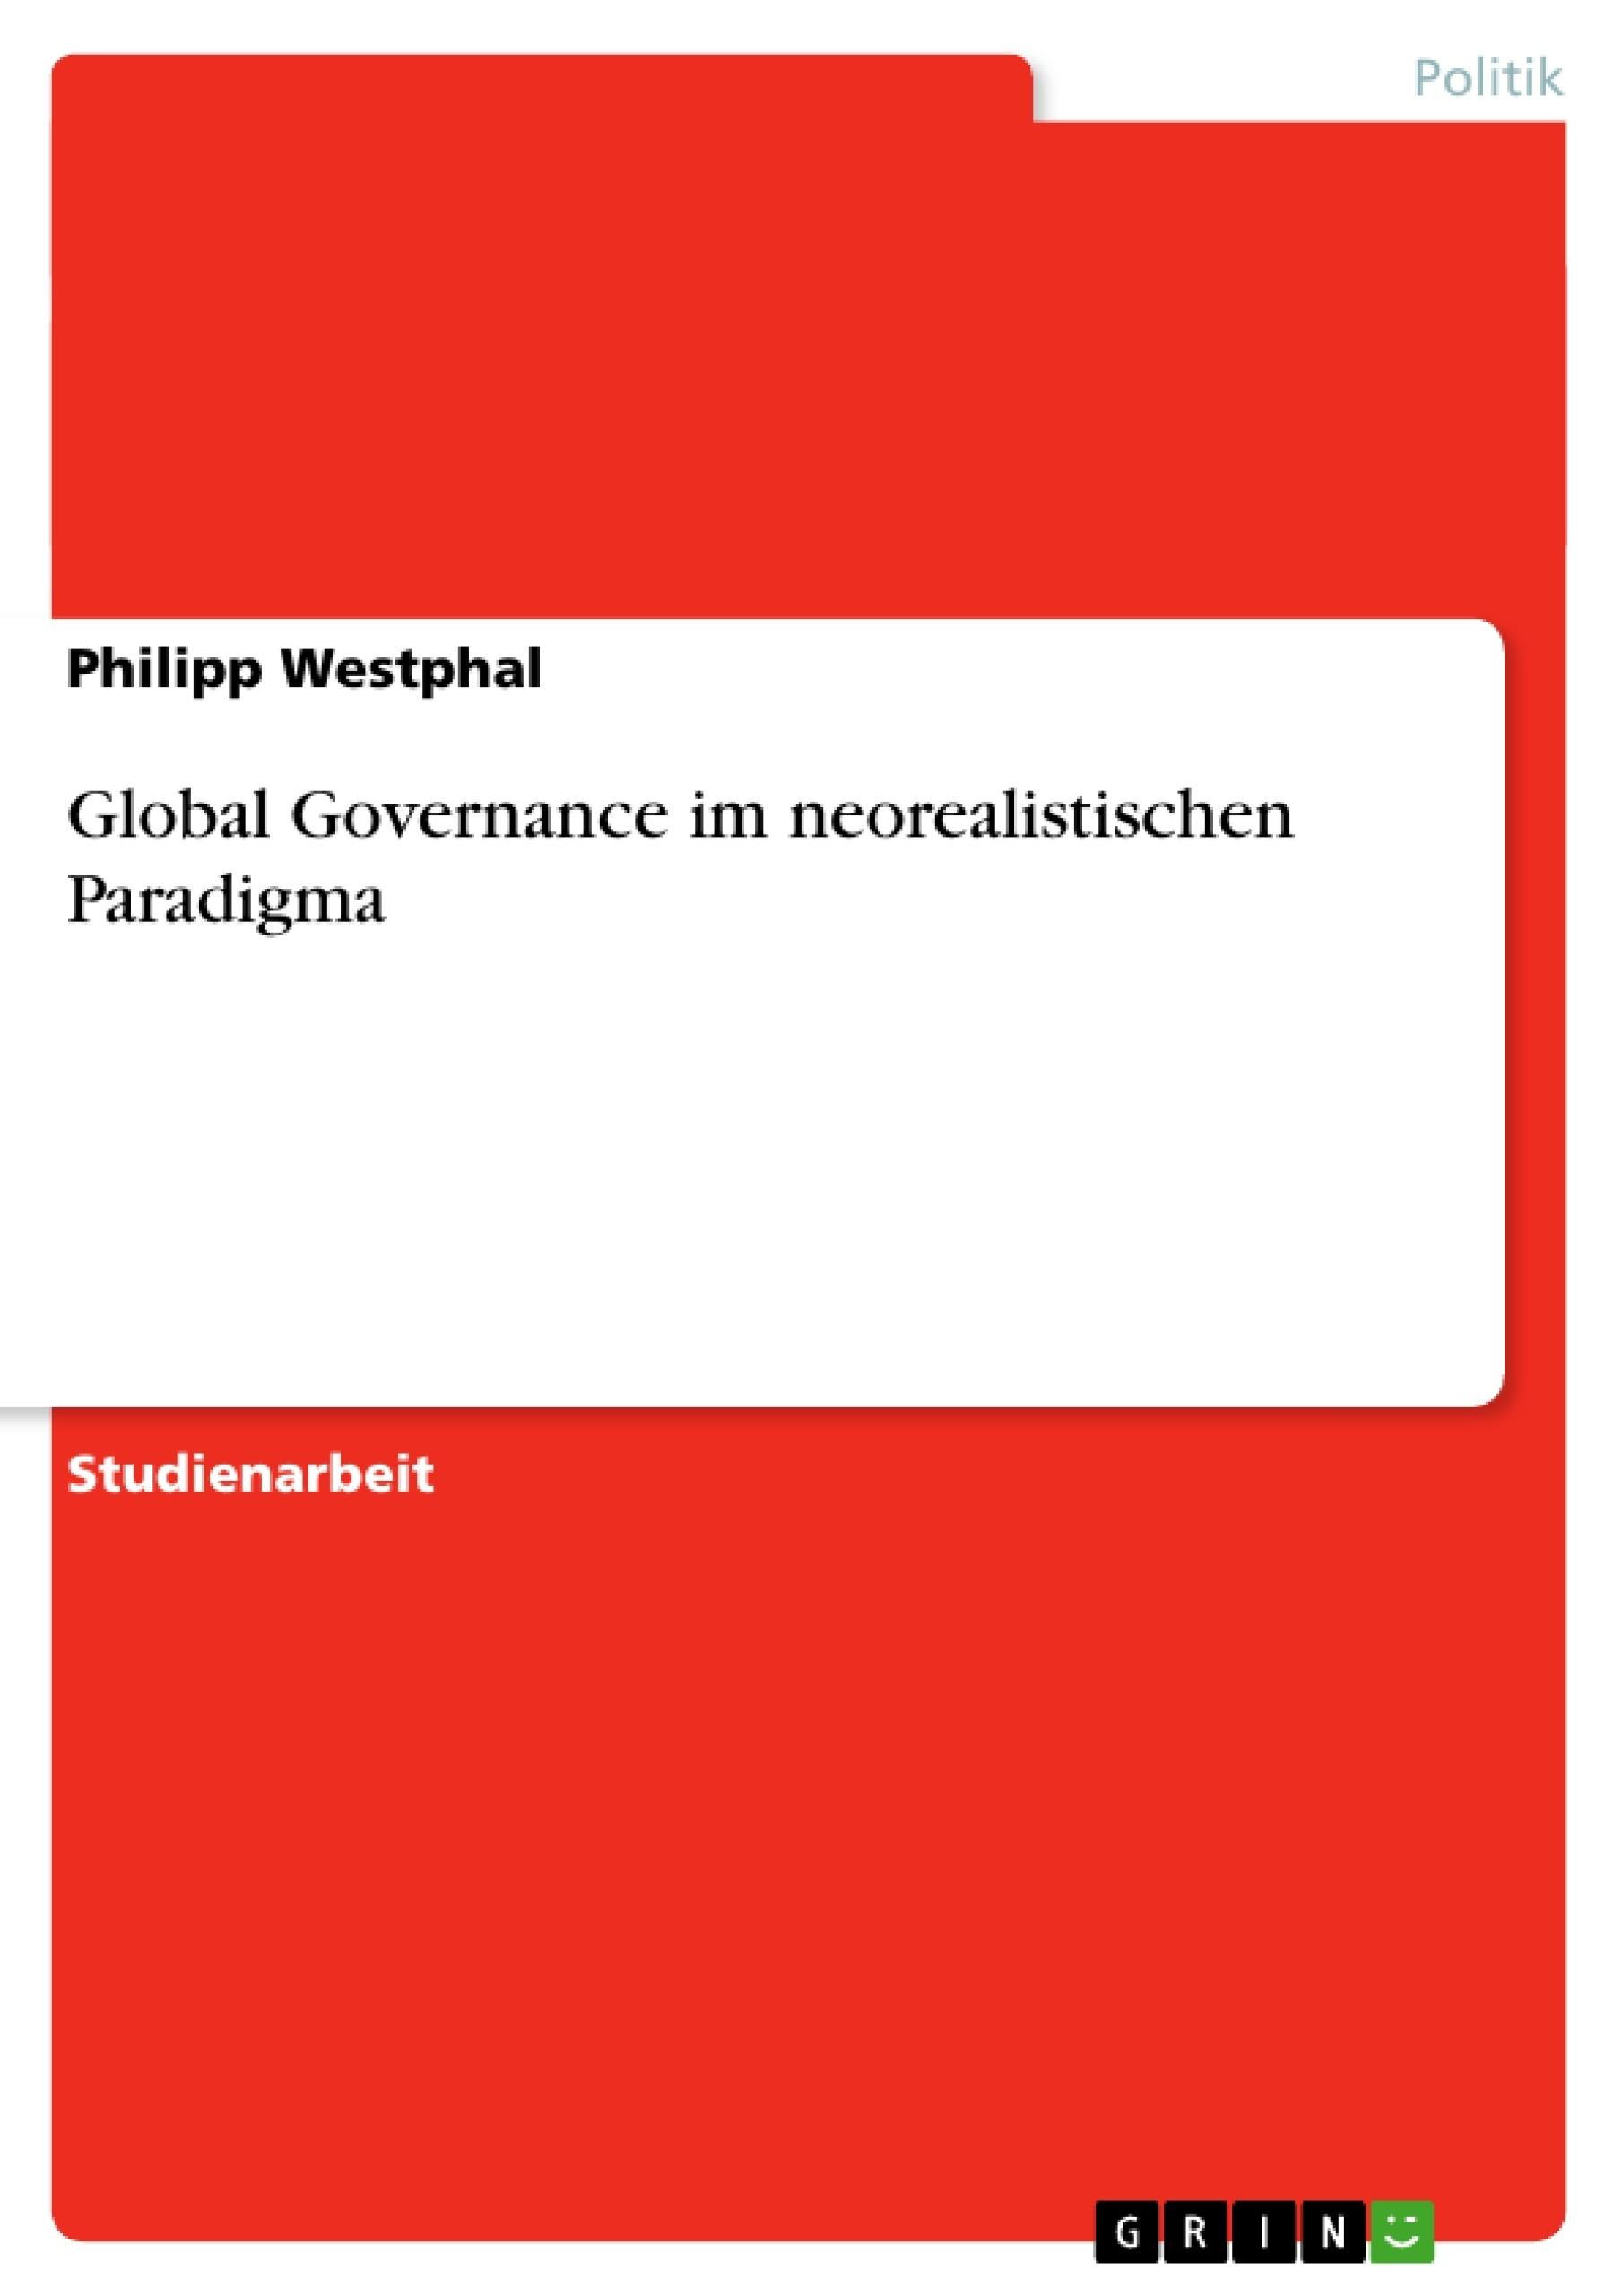 Titel: Global Governance im neorealistischen Paradigma